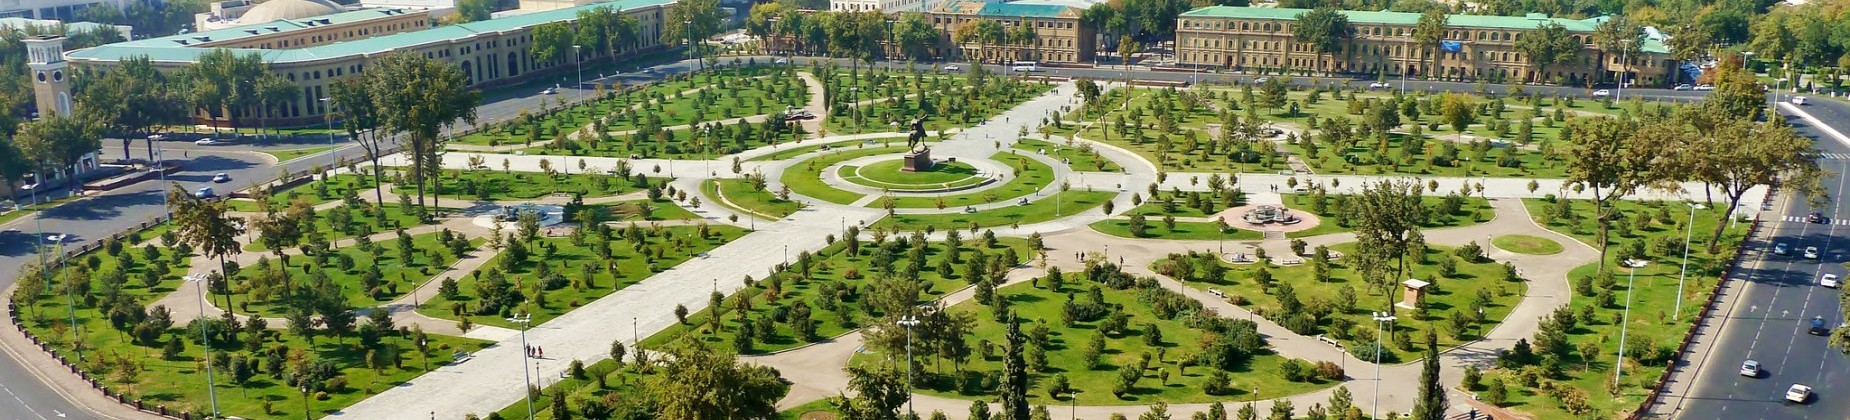 Tashkent City Tour - 1